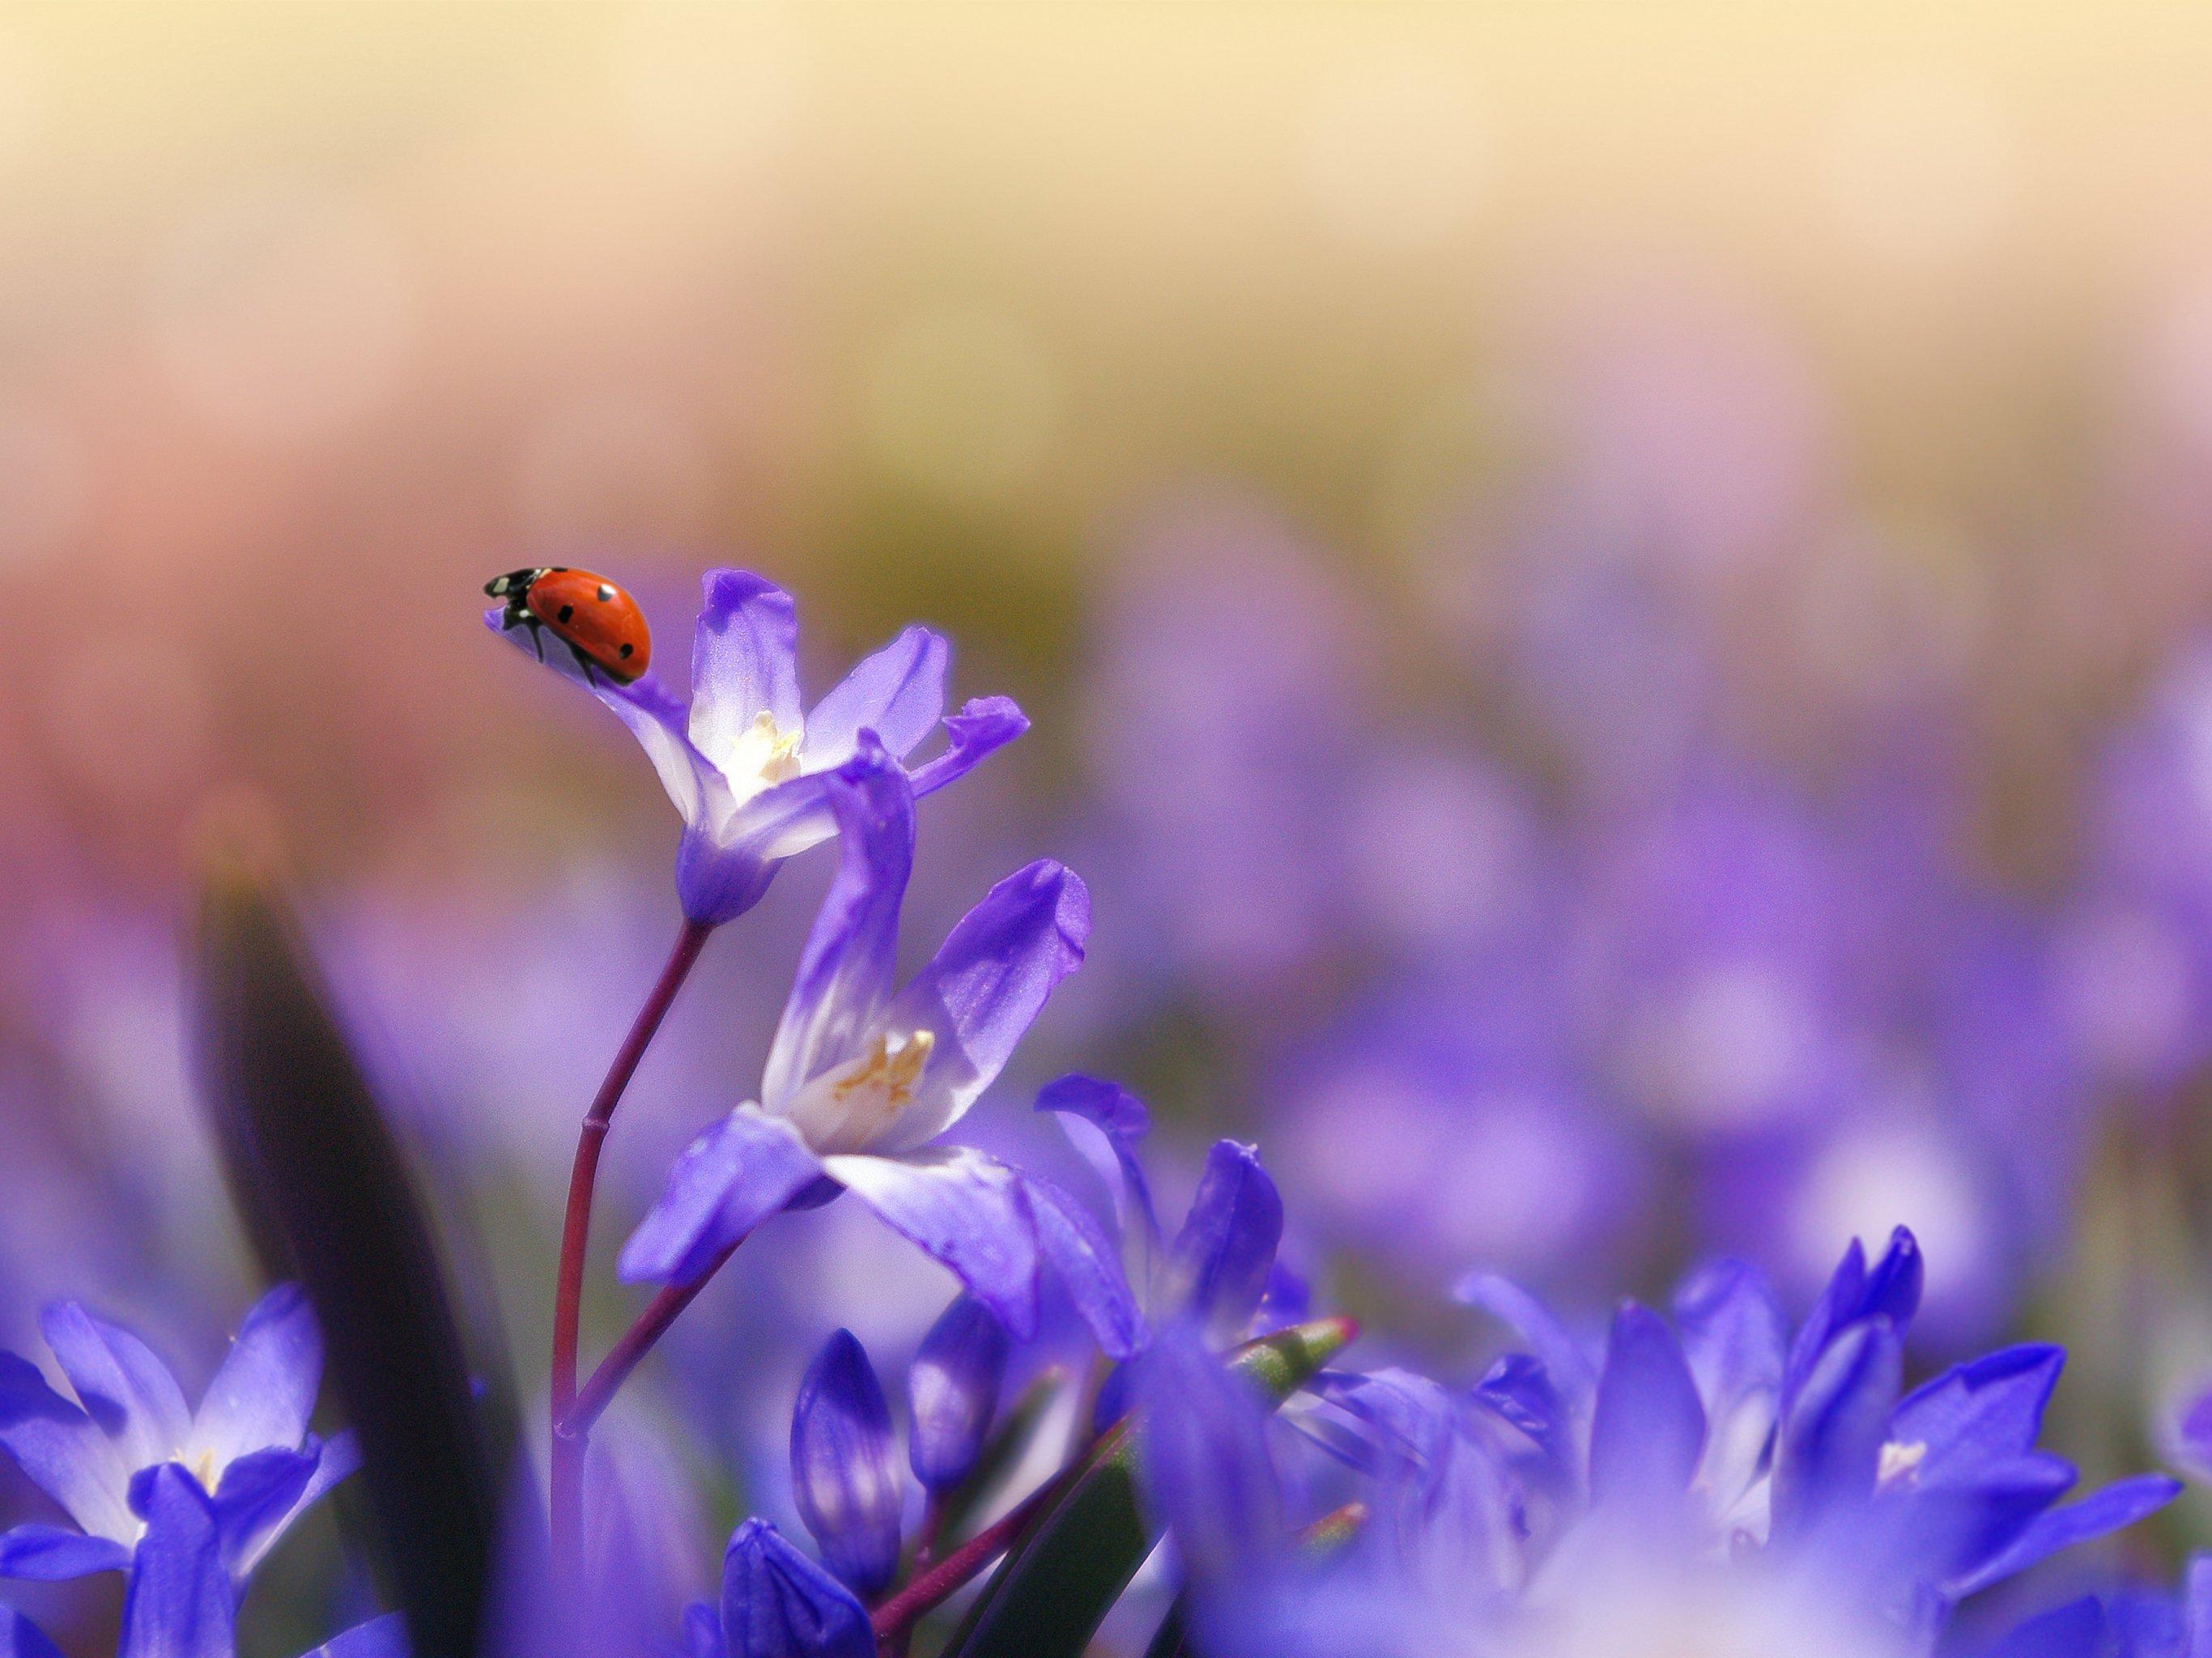 Iphone Android Desktop: Ladybug On Purple Flower Wallpaper